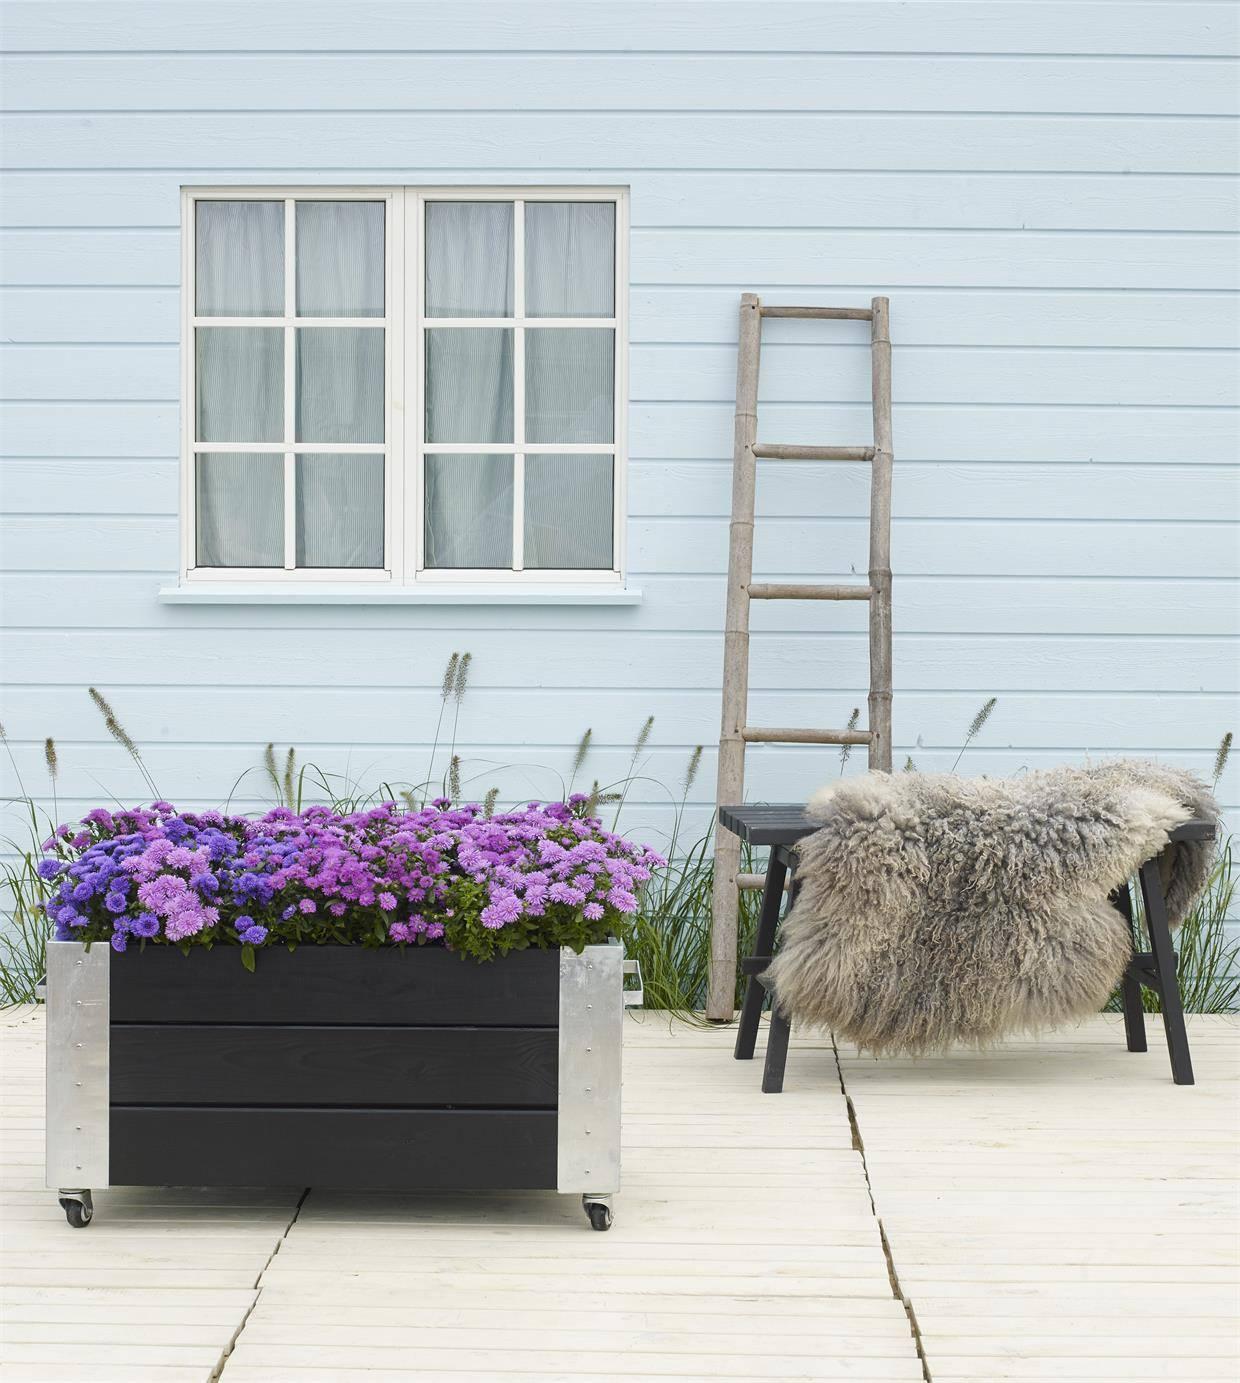 PLUS Cubic blomsterkasse 87x50x45cm